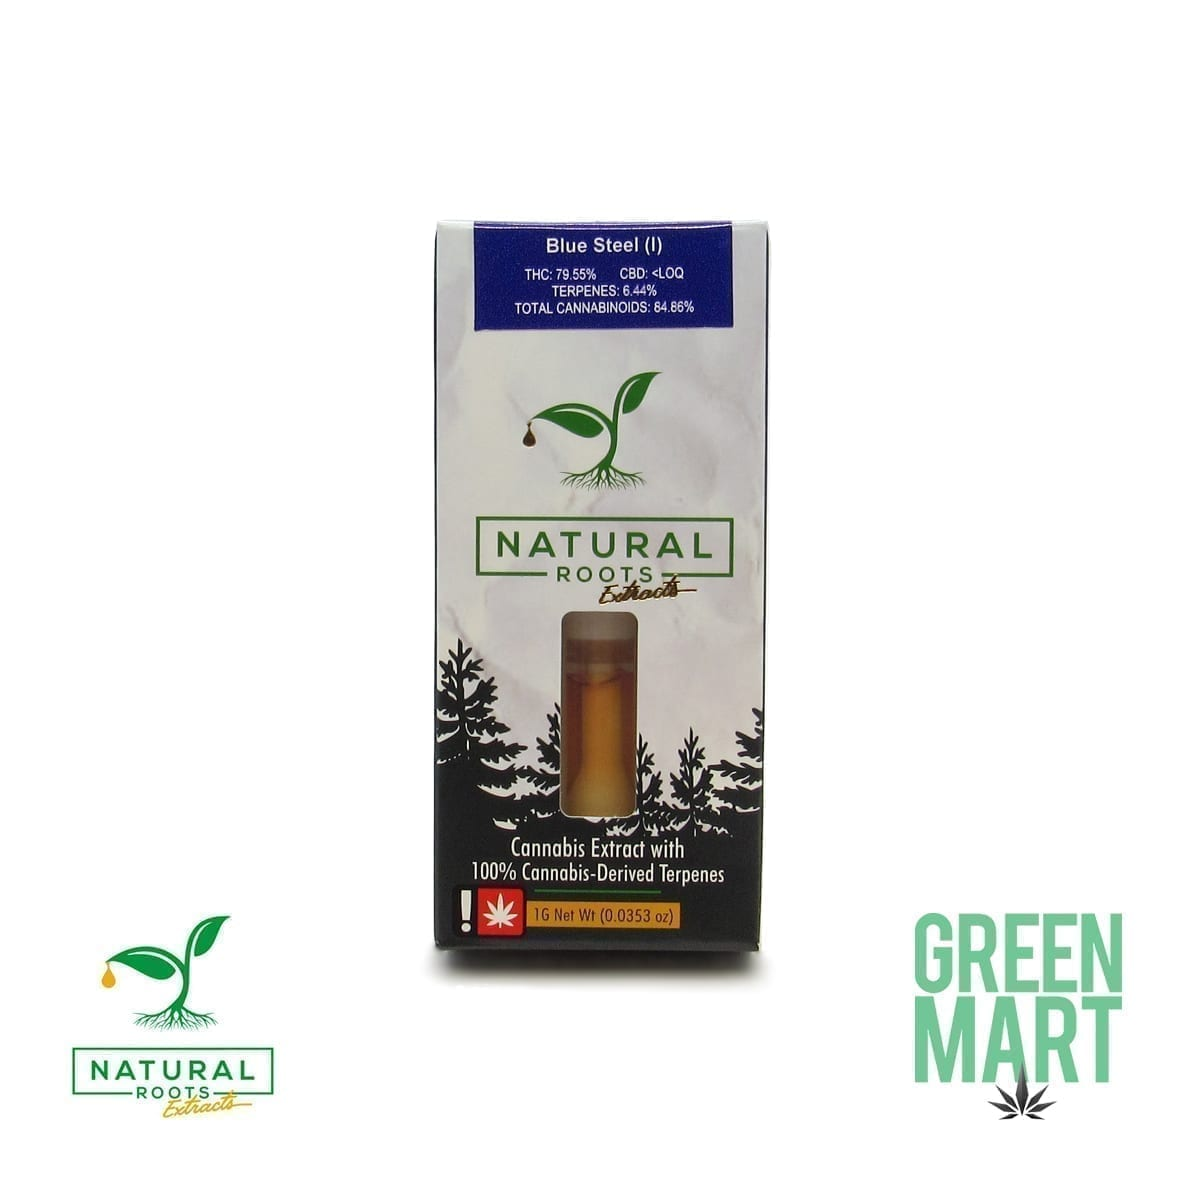 Natural Roots Distillate Cartridge - Blue Steel